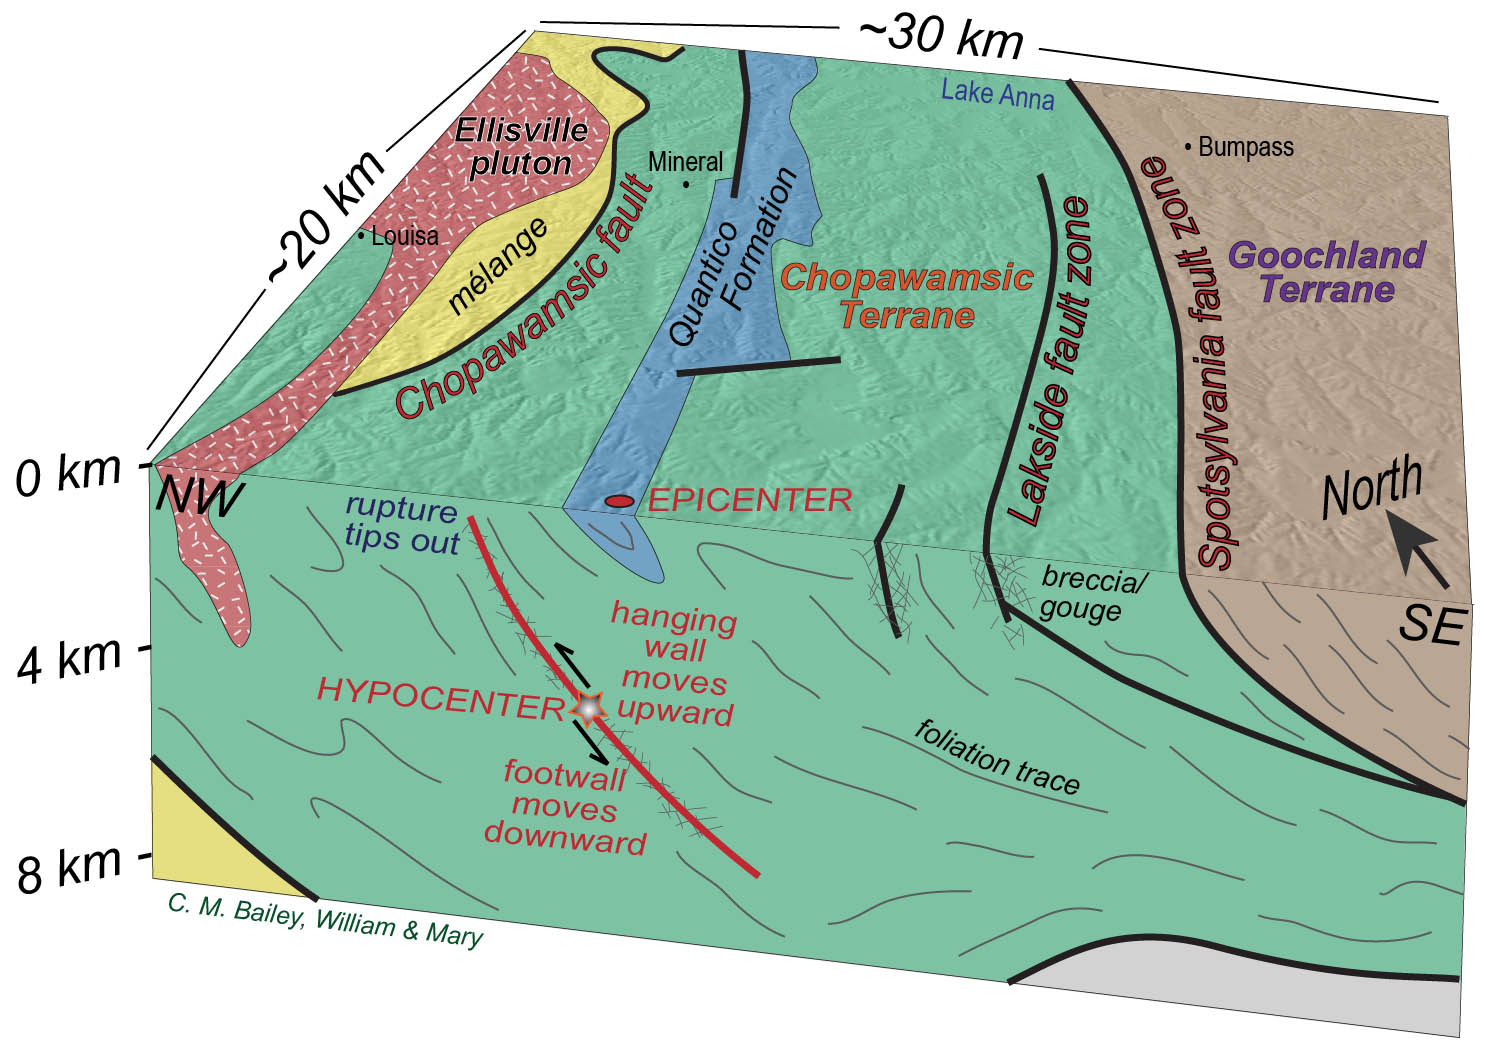 fault block diagram cobalt oxide lewis all shook up the 2011 virginia earthquake william